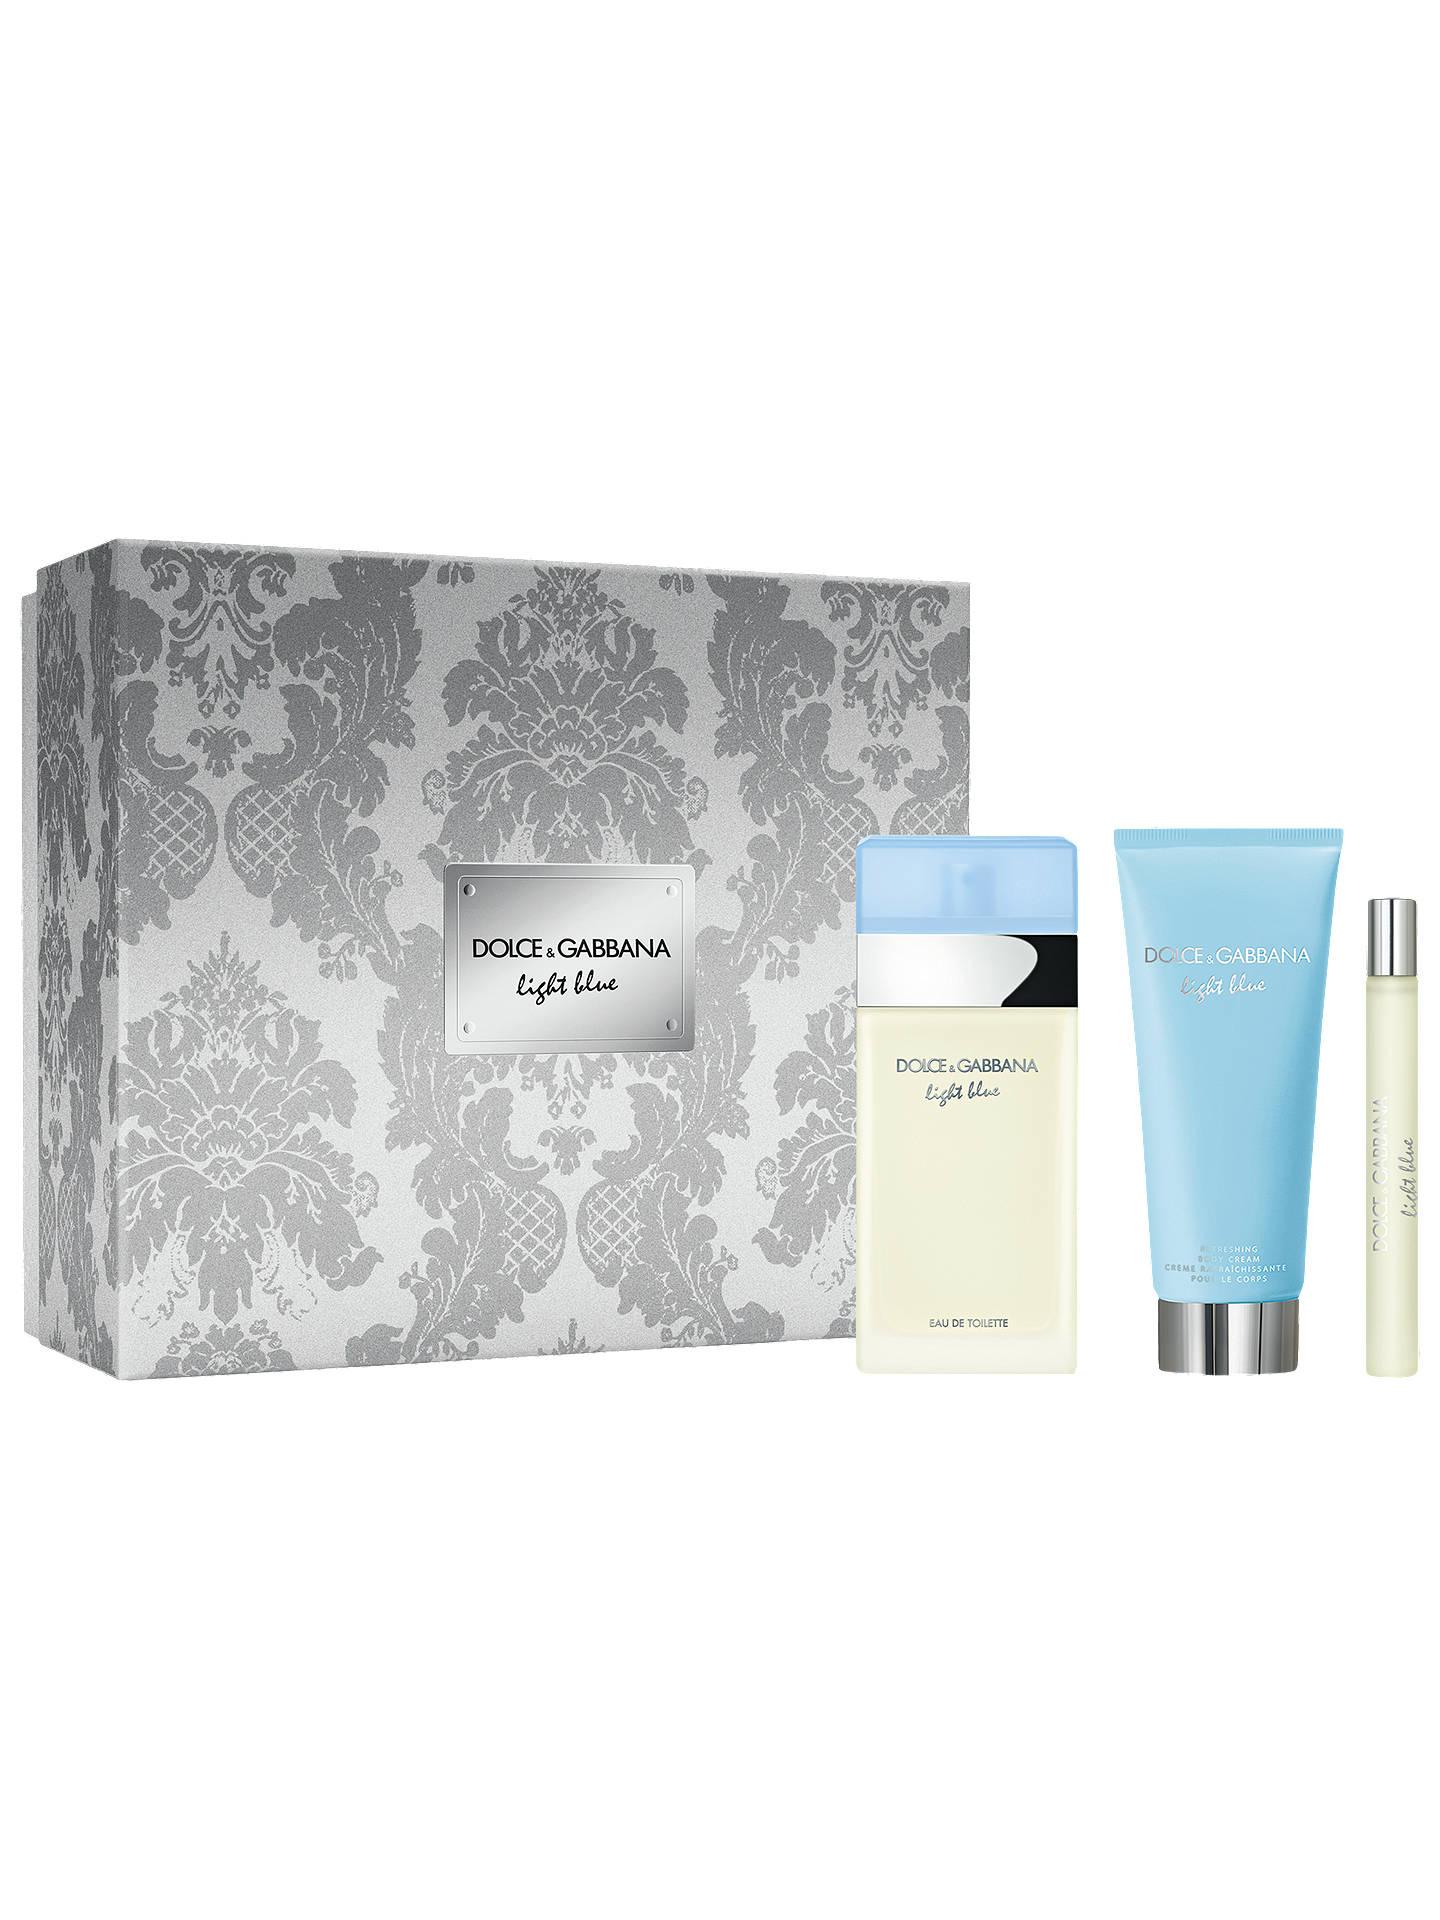 83eb5083 Buy Dolce & Gabbana 100ml Light Blue Eau de Toilette Fragrance Gift Set  Online at johnlewis